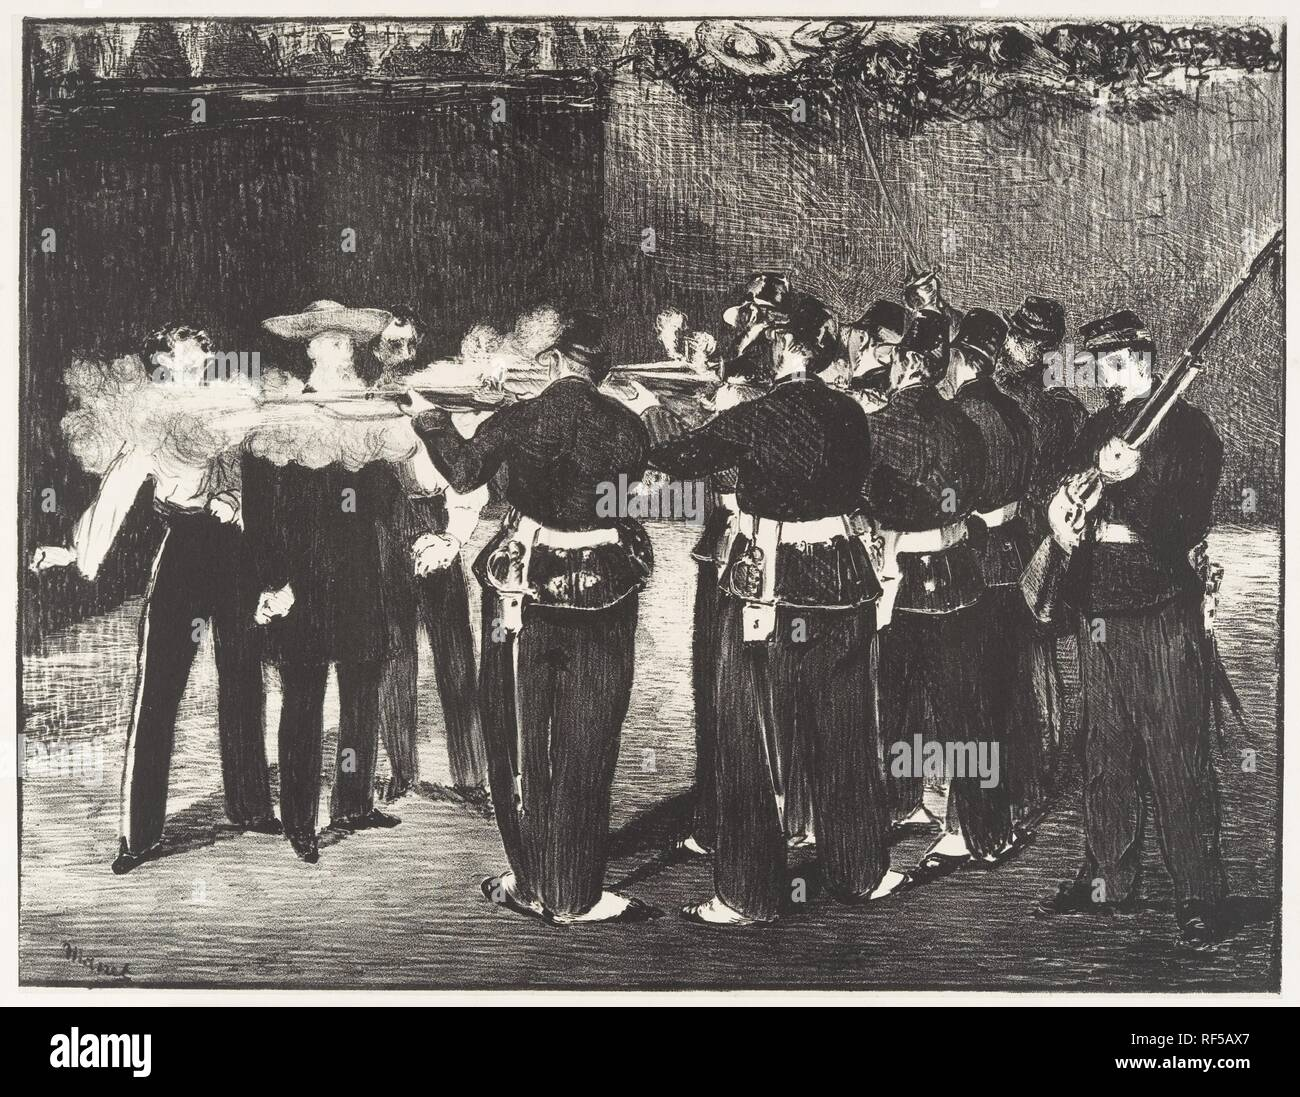 The Execution of the Emperor Maximilian (L'exécution de Maximilien). Artist: Édouard Manet (French, Paris 1832-1883 Paris). Dimensions: 13 3/8 x 17 1/4in. (34 x 43.8cm)  Sheet: 17 1/2 x 23 3/4in. (44.5 x 60.3cm). Date: 1868. Museum: Metropolitan Museum of Art, New York, USA. - Stock Image